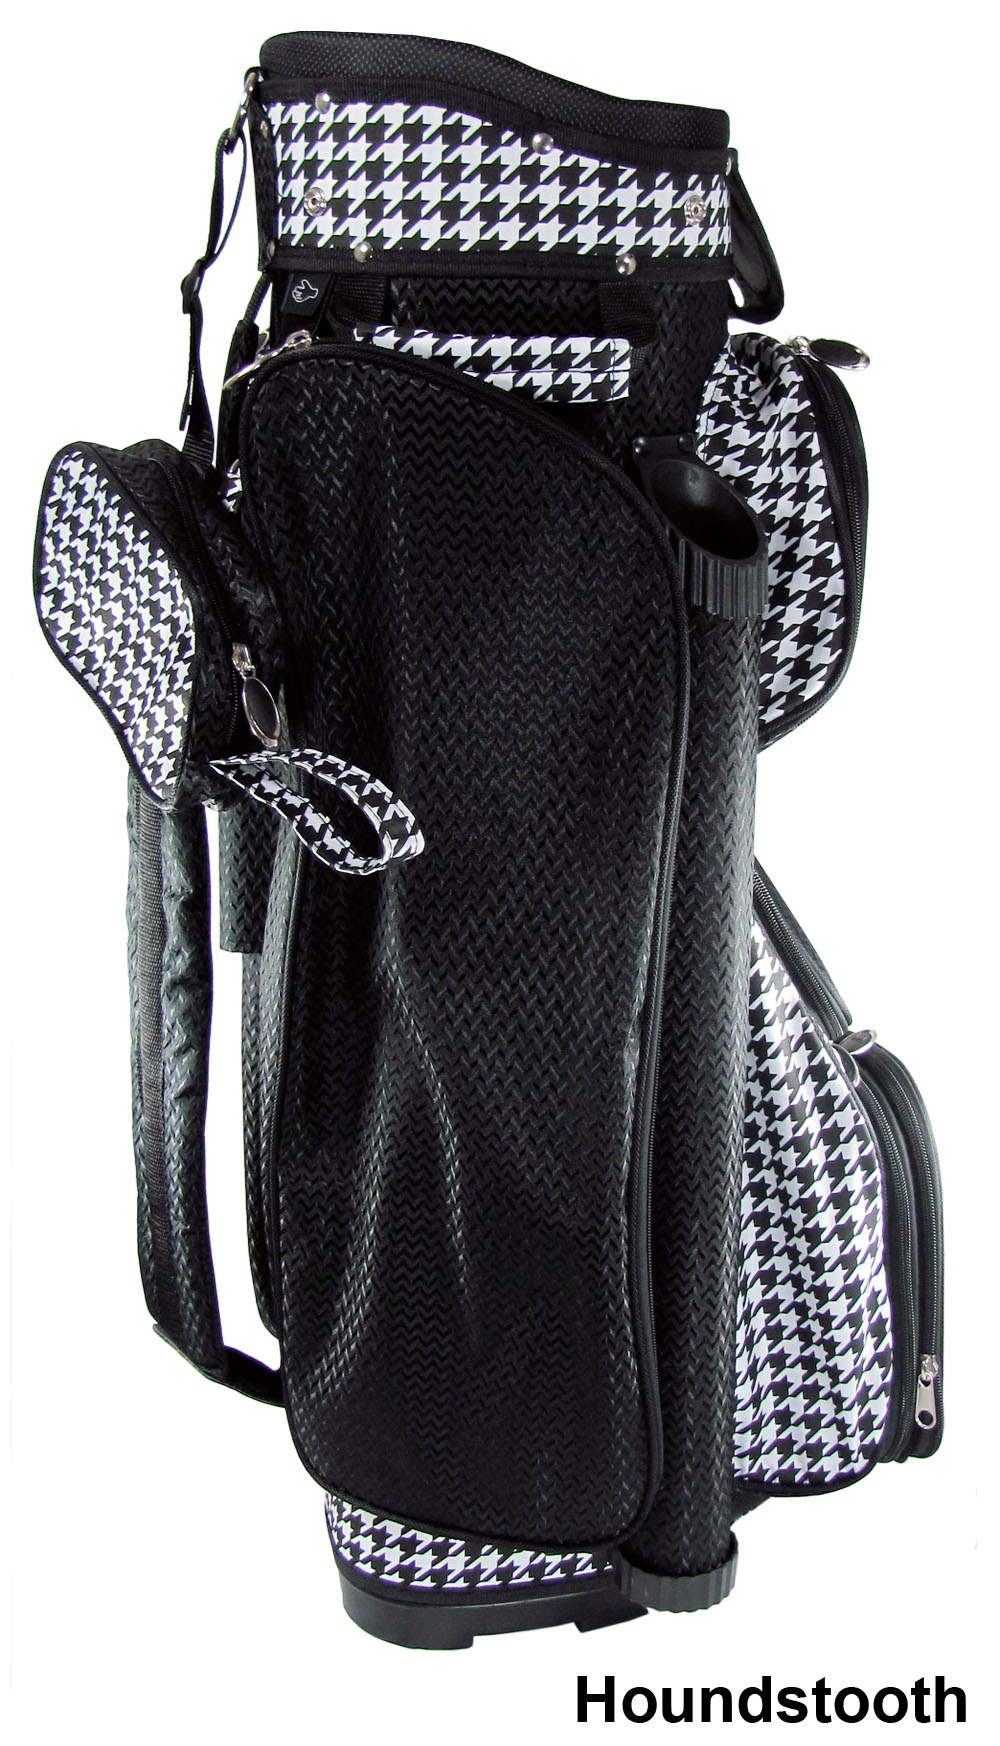 New RJ Sports Golf Ladies Boutique Cart Bag Houndstooth Black White